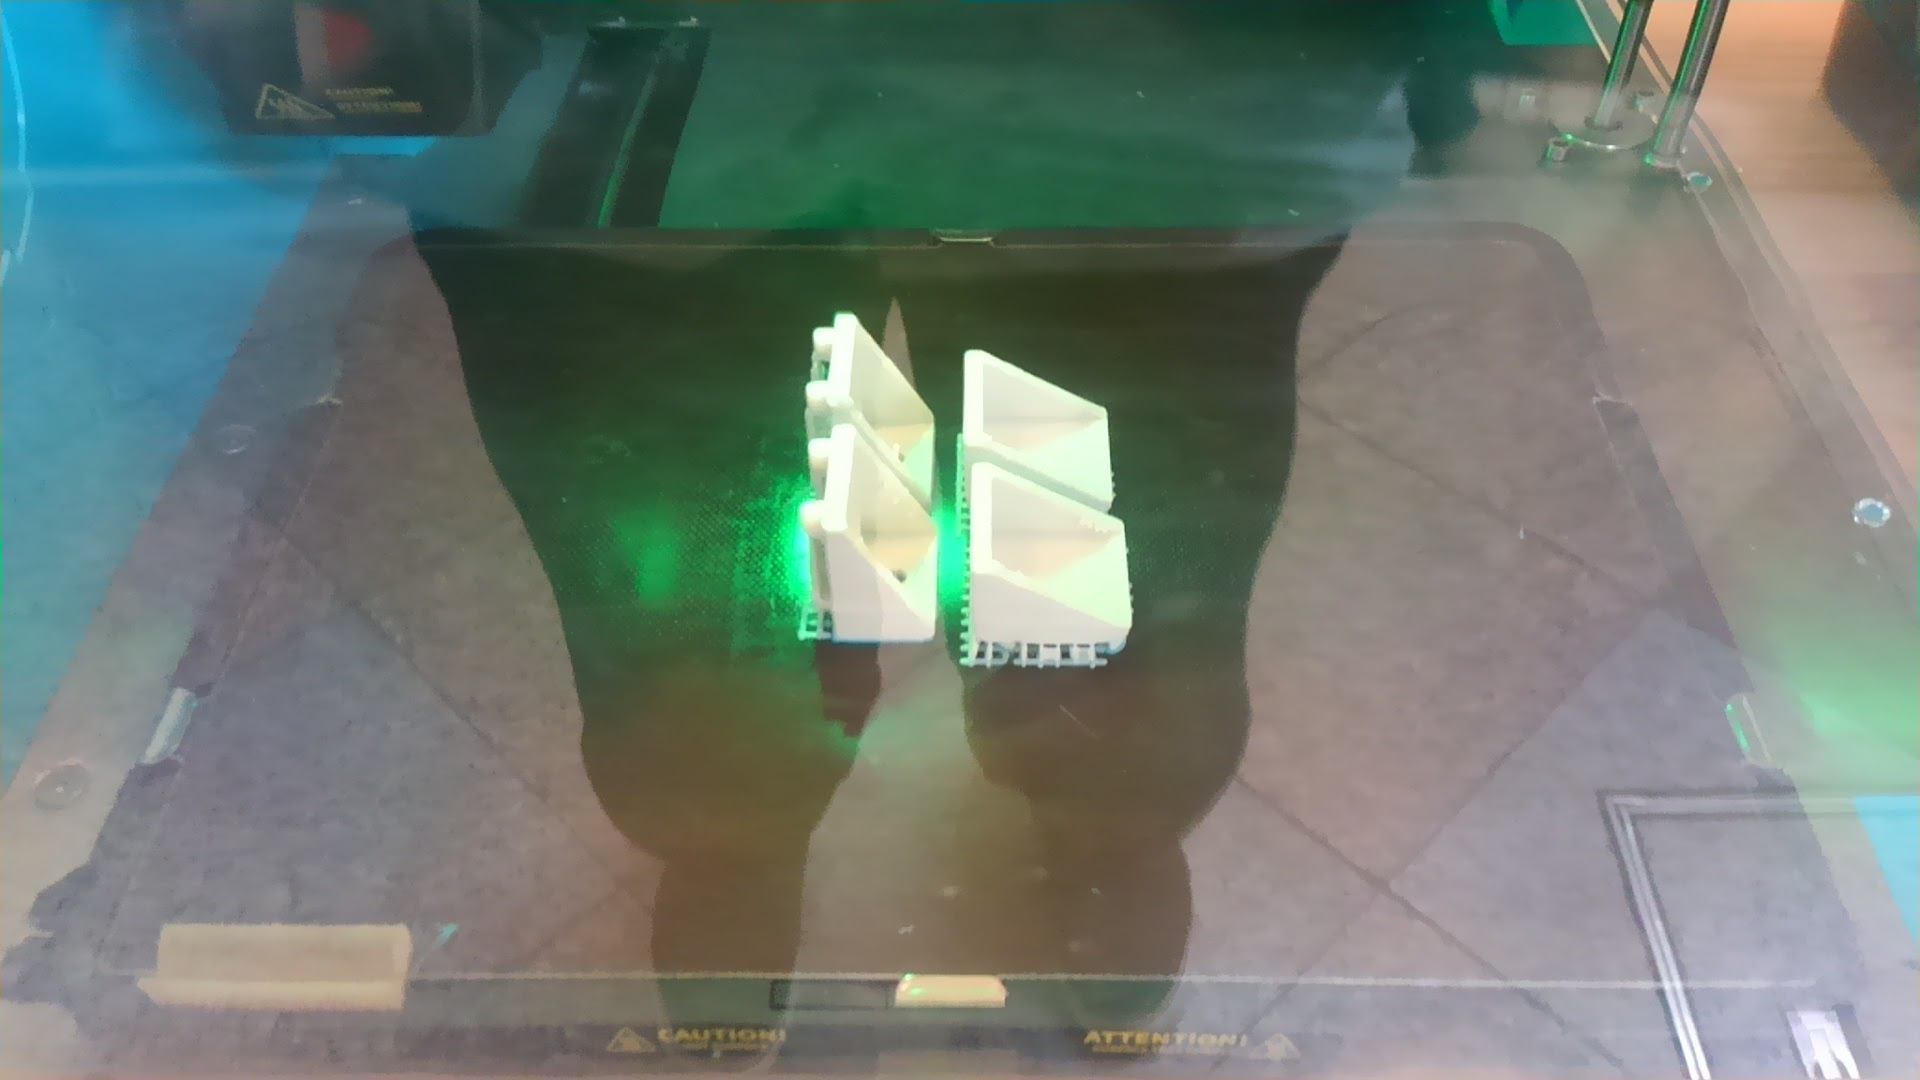 nakano-3dprinter-stl-data-1st_7